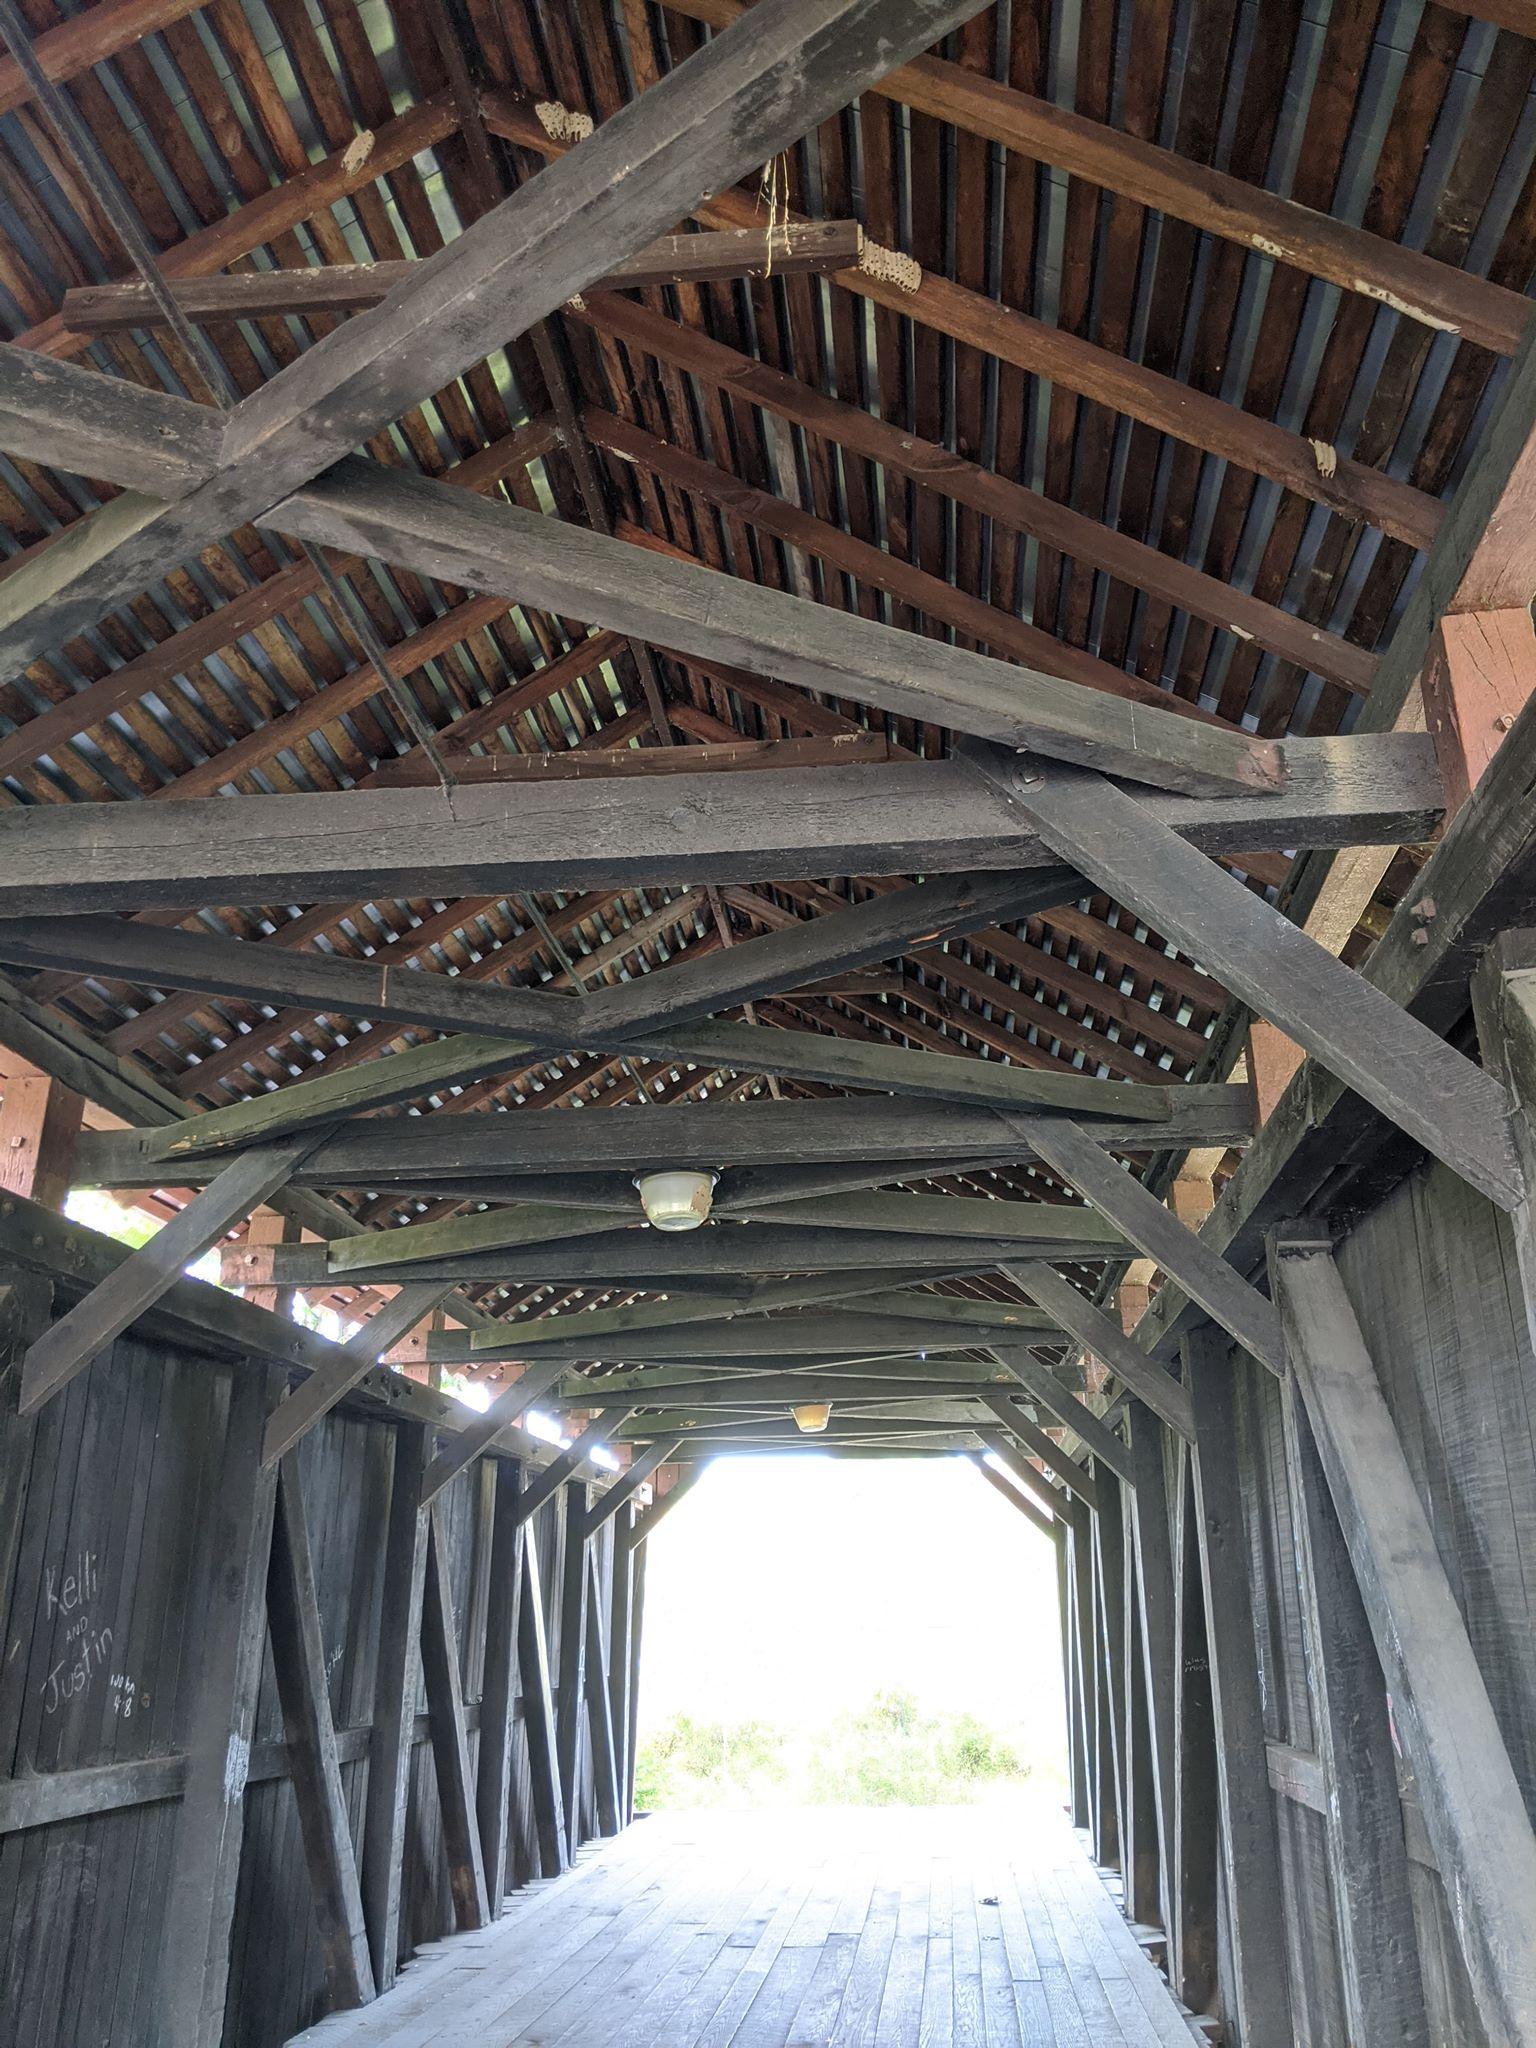 Interior view of the bridge